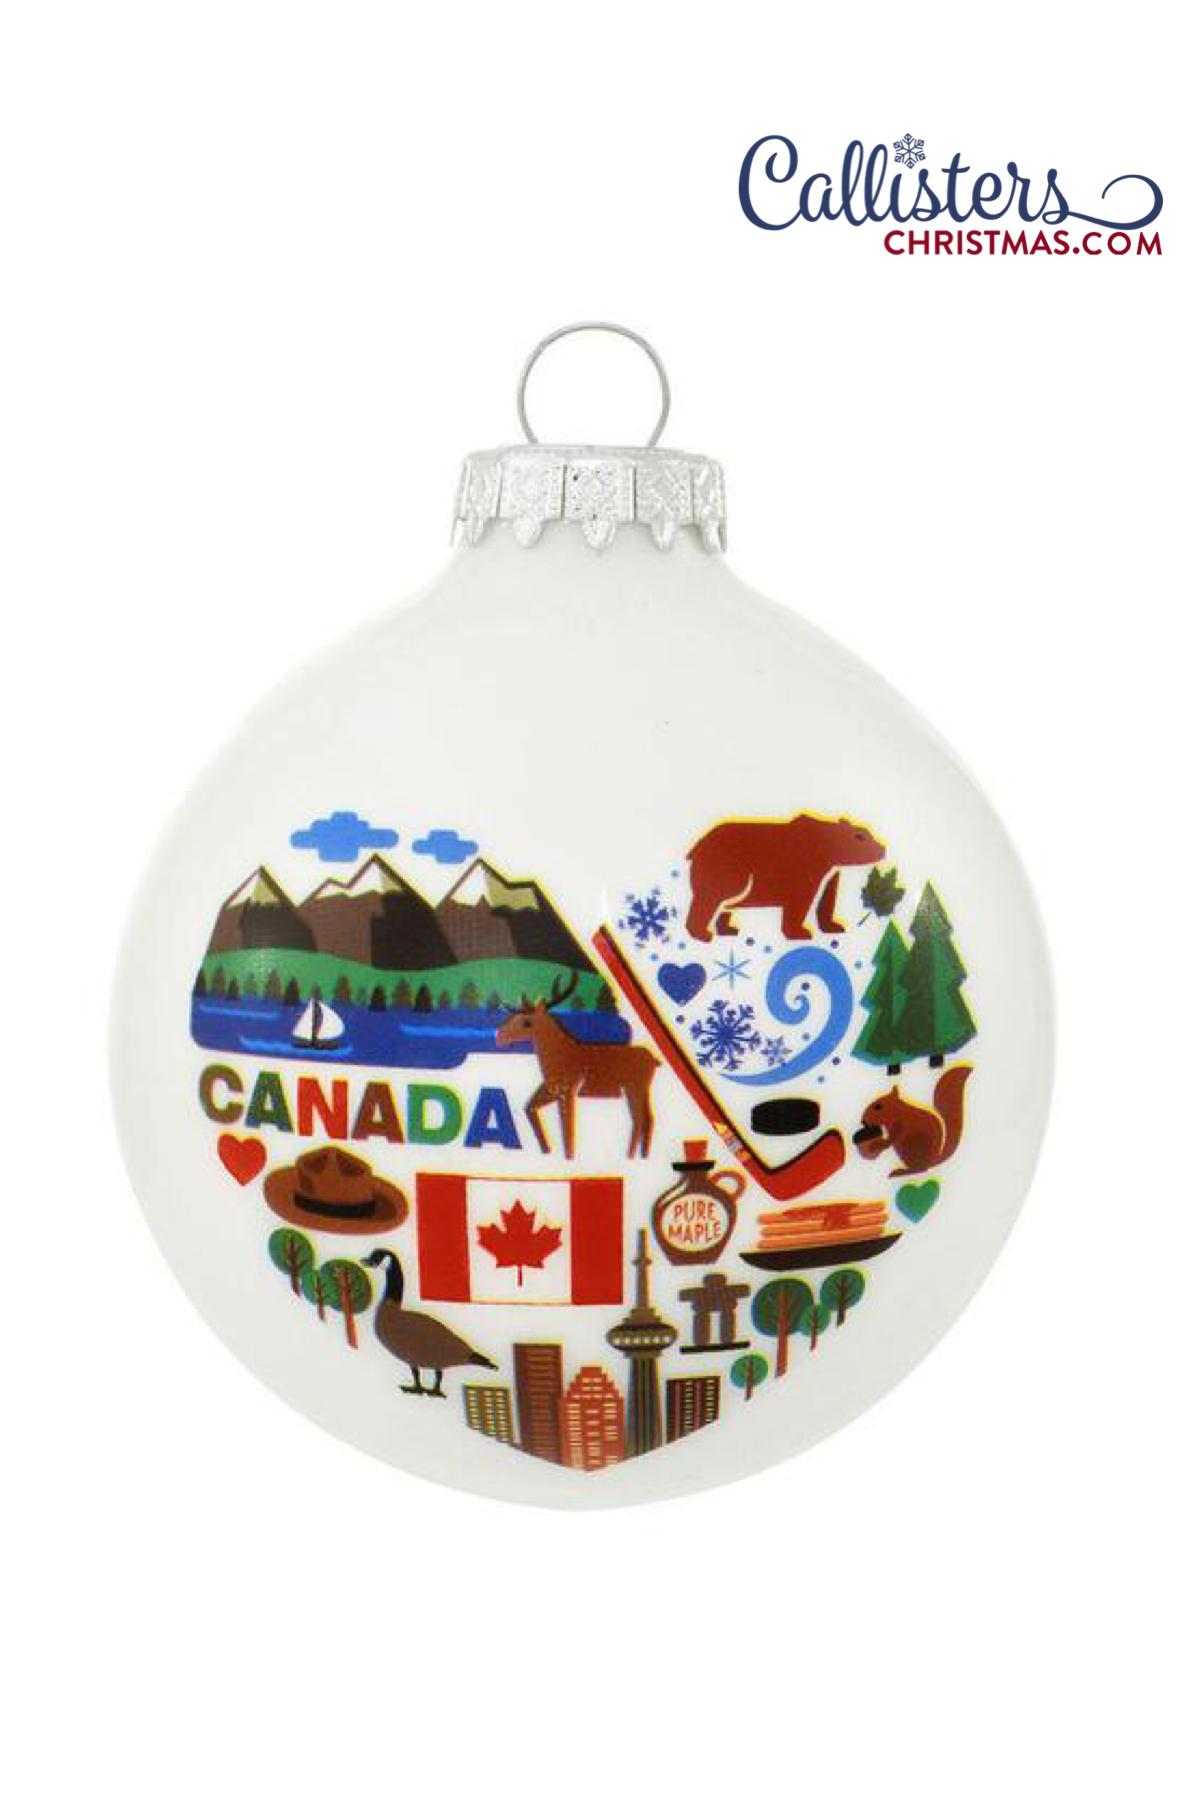 Canada Ornament Old world christmas ornaments, Ornaments